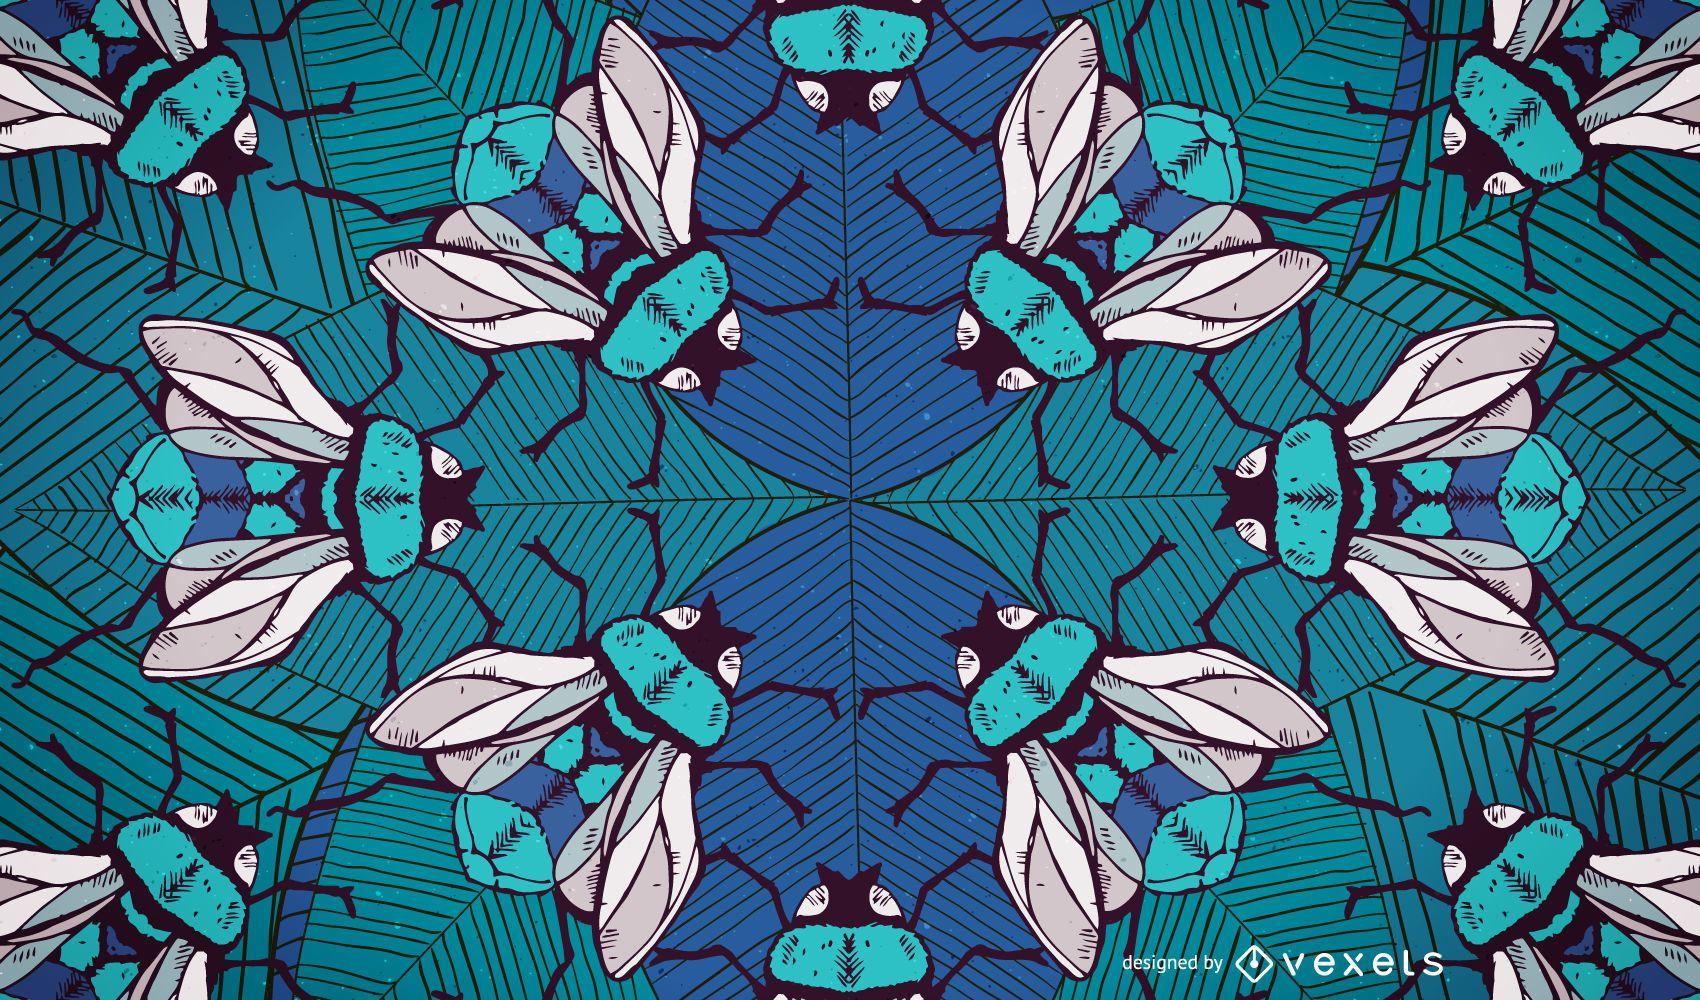 Diseño ilustrado de fondo de abejorros